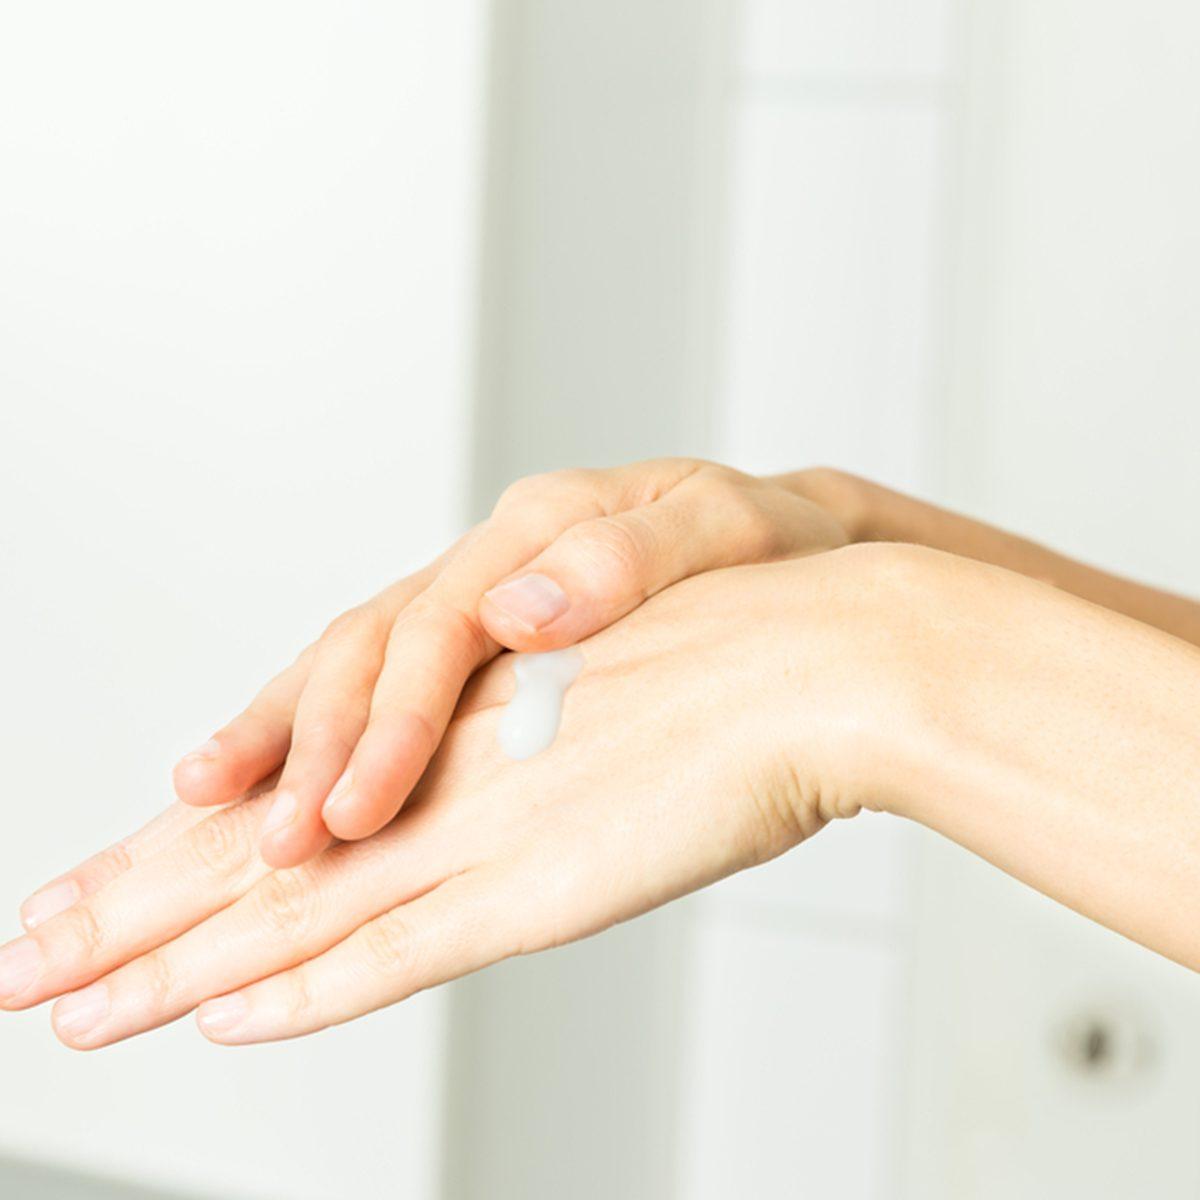 Female hands applying cream